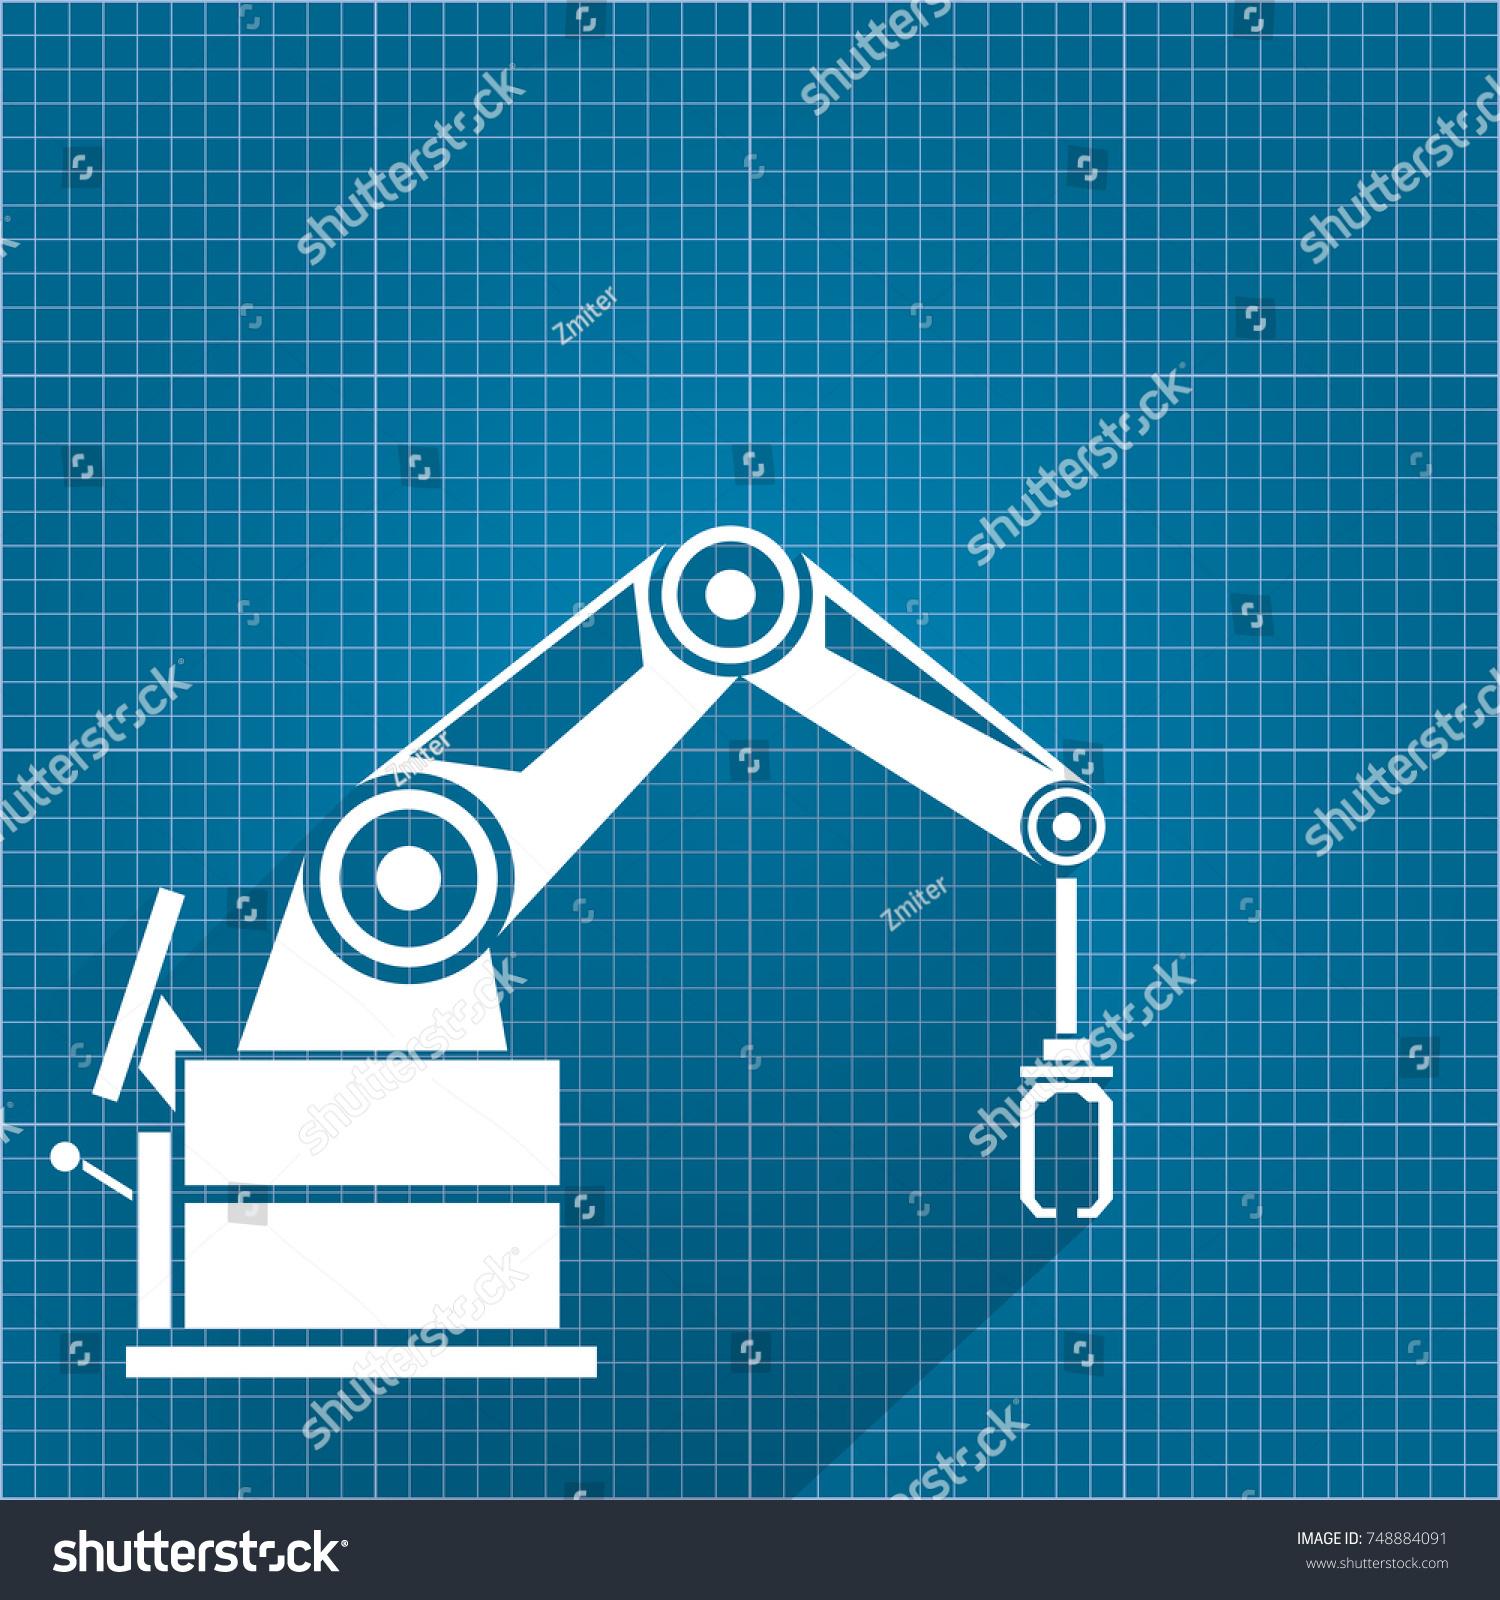 Vector robotic arm symbol on blueprint stock vector 748884091 vector robotic arm symbol on blueprint stock vector 748884091 shutterstock malvernweather Choice Image